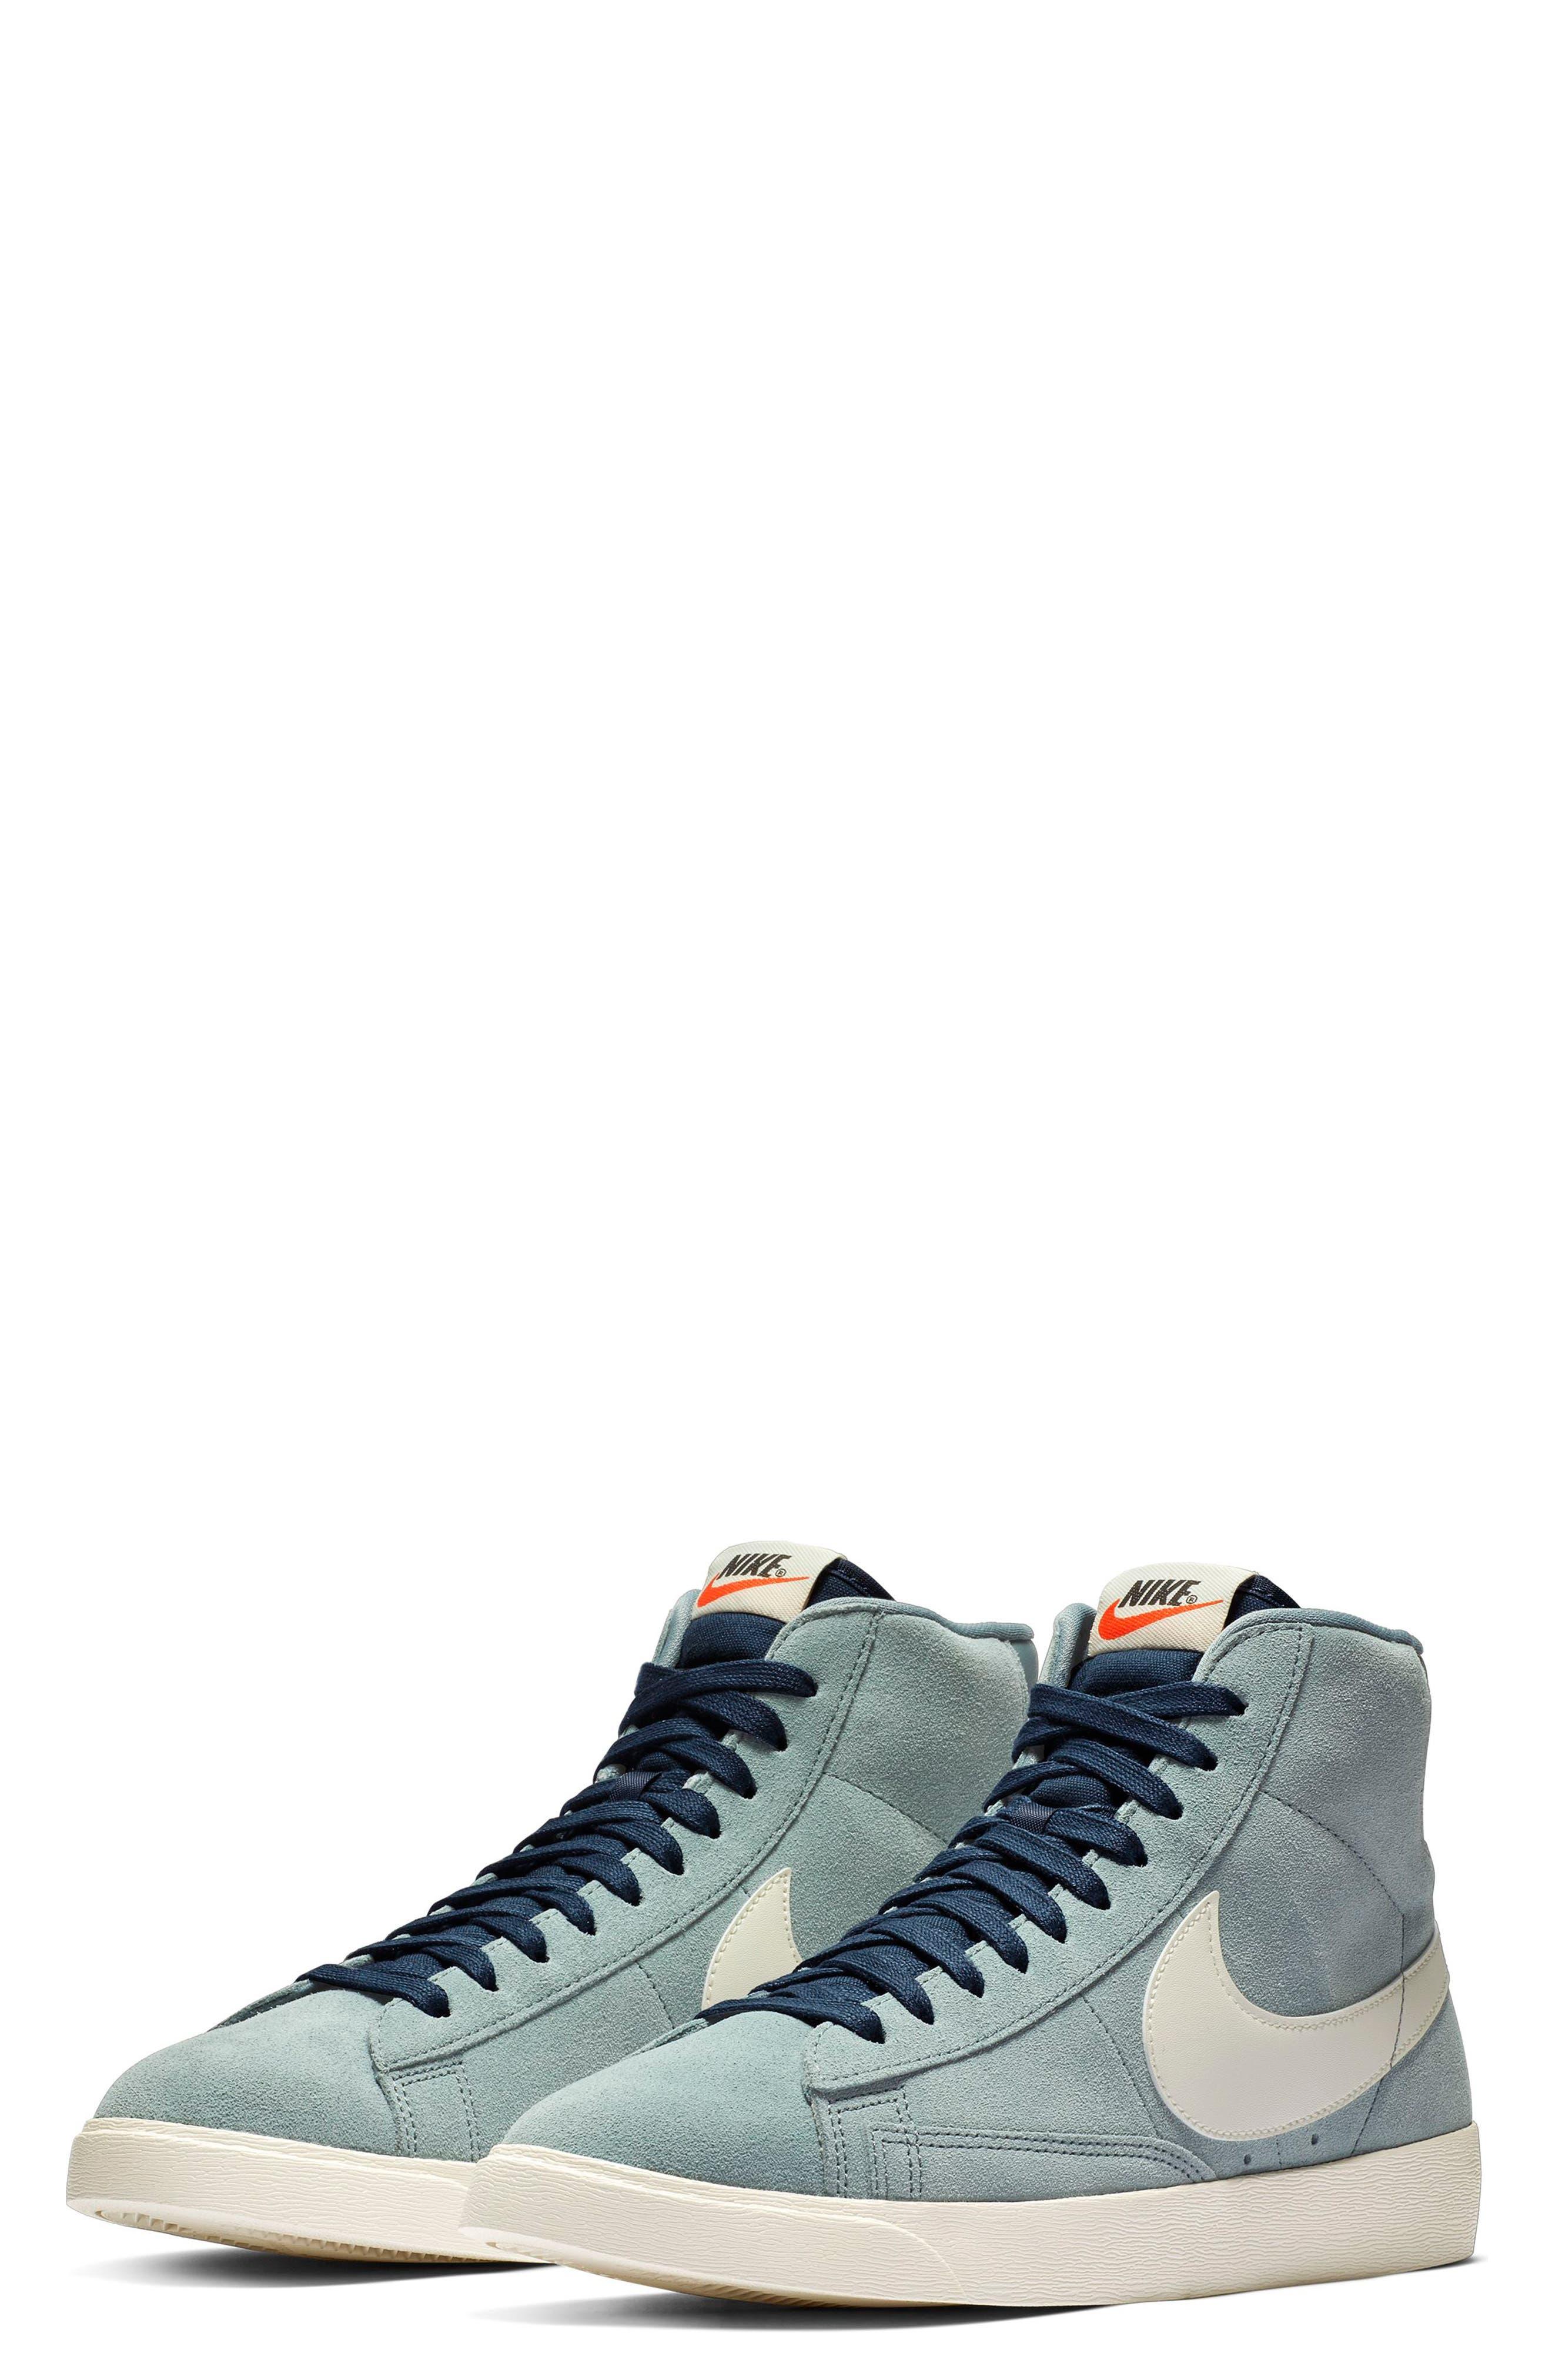 NIKE, Blazer Mid Vintage Sneaker, Main thumbnail 1, color, AVIATOR GREY/ SAIL/ BLUE